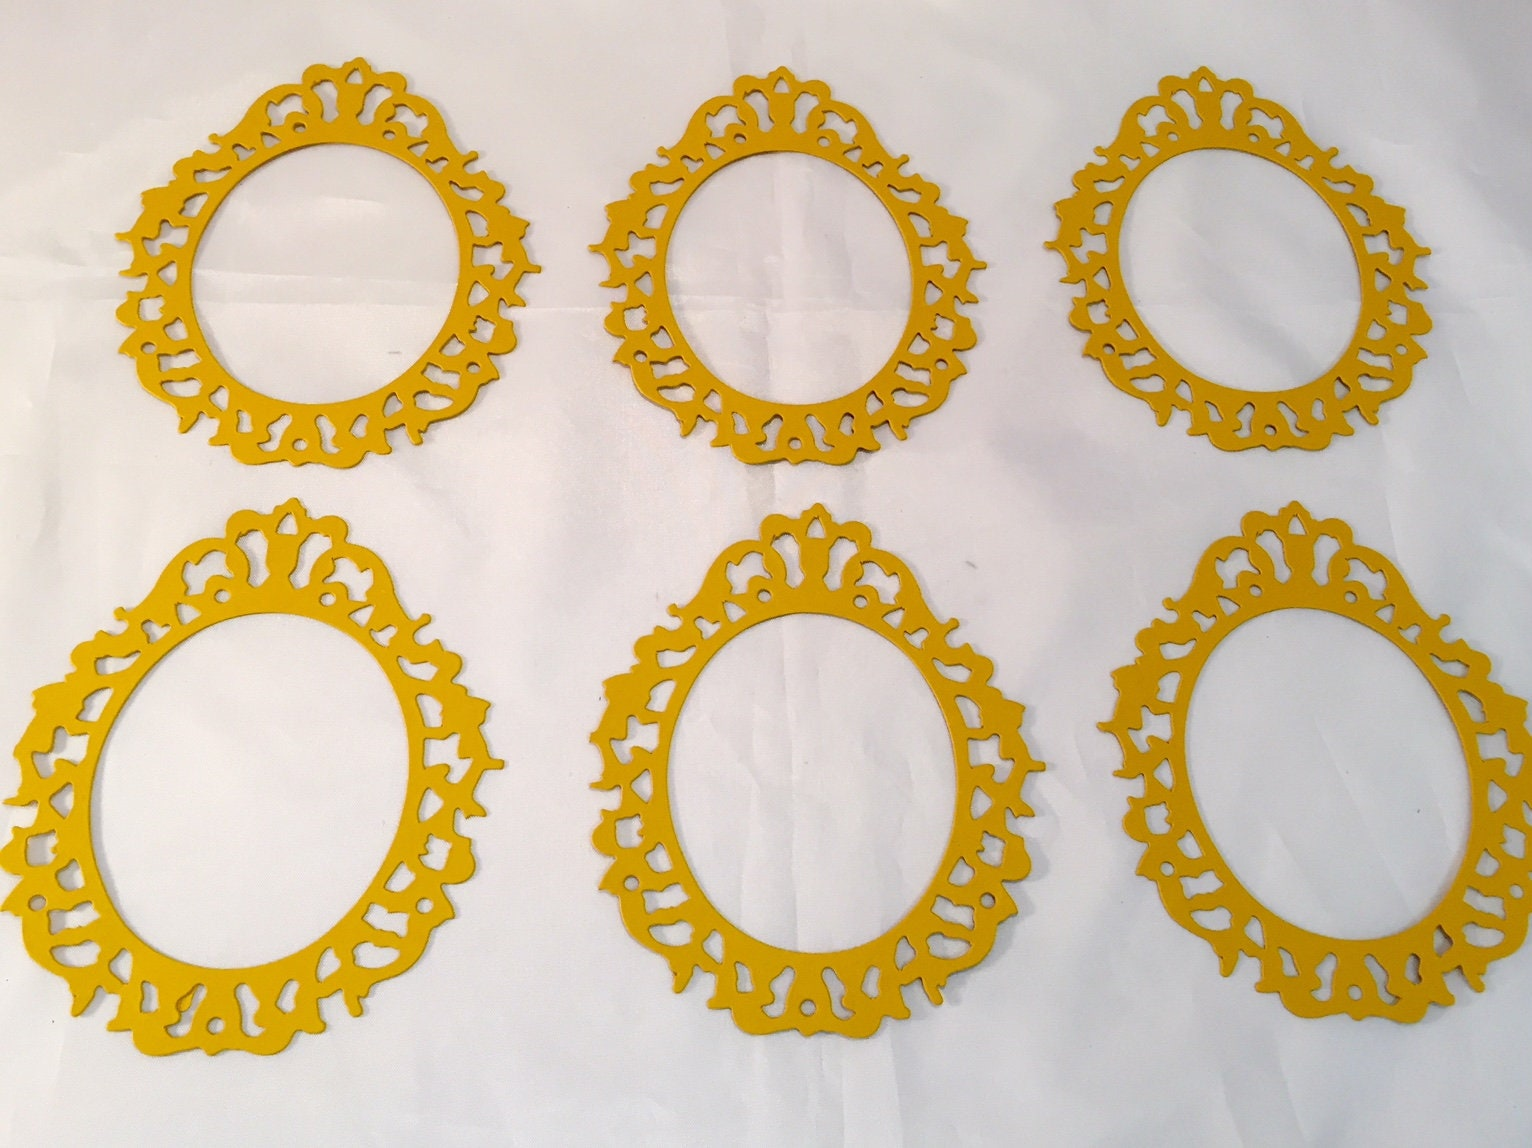 Tim Holtz Die Cuts Oval Ornate Frame Six Frames | Etsy